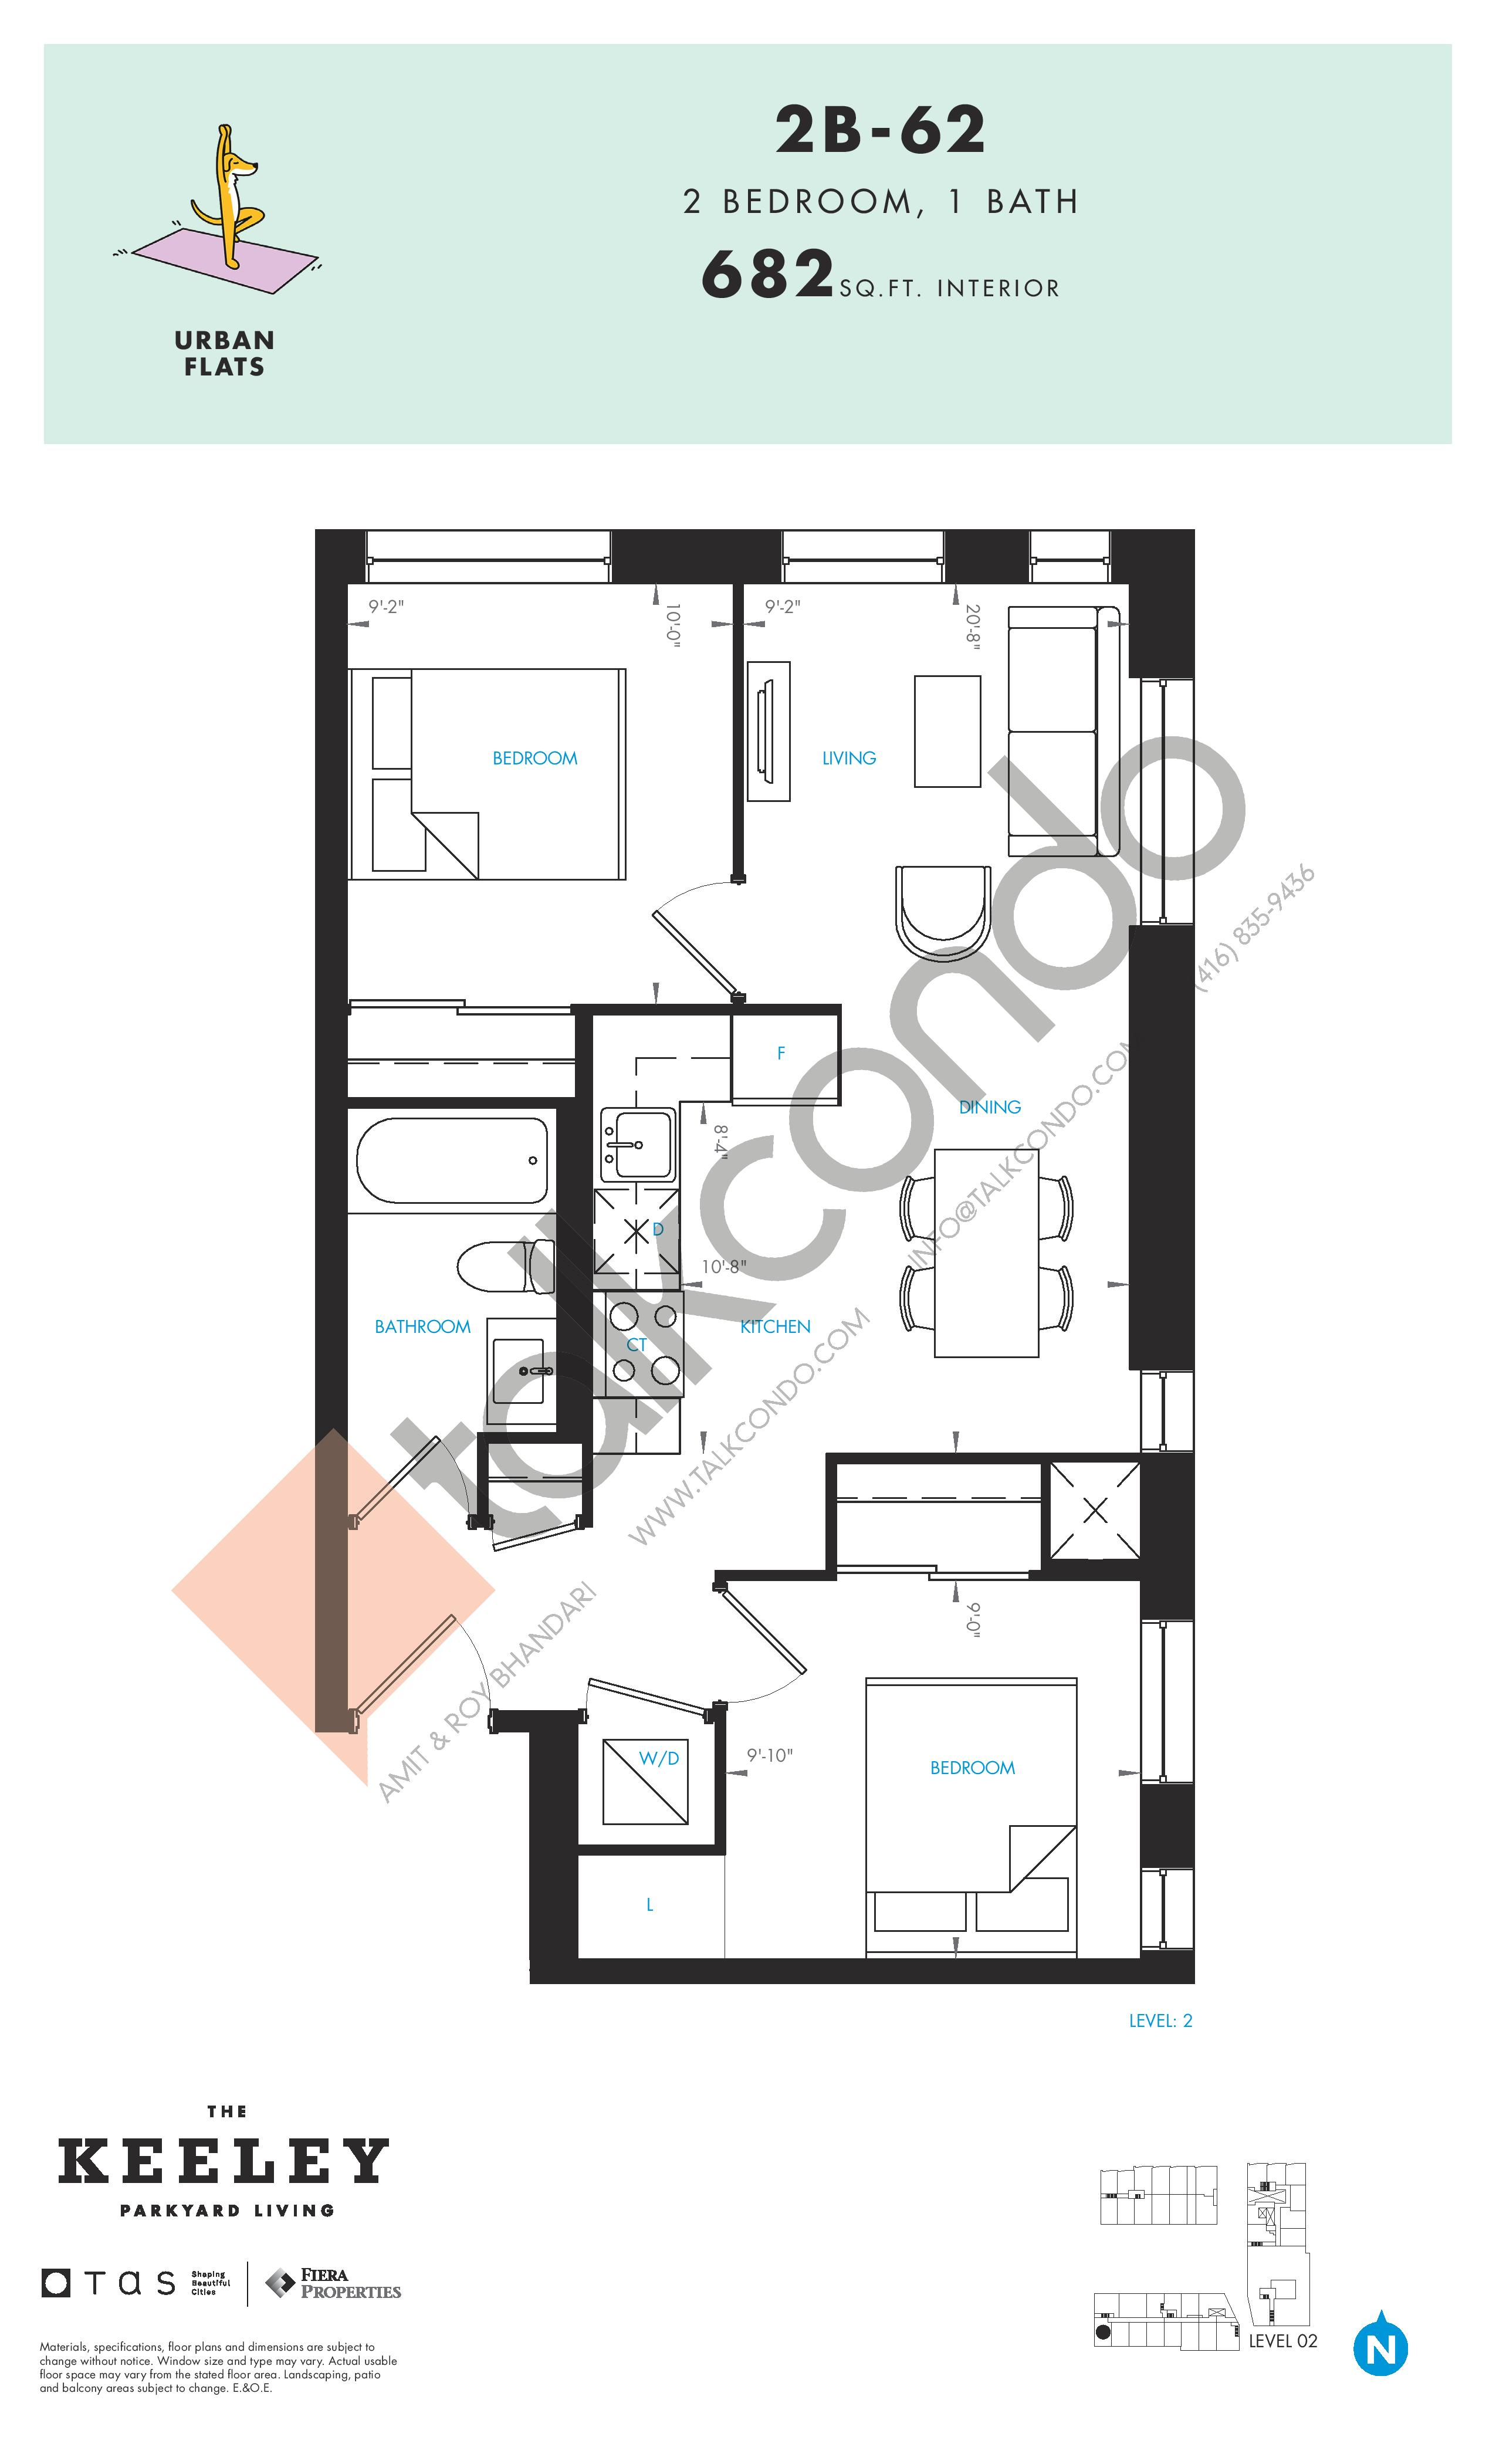 2B-62 Floor Plan at The Keeley Condos - 682 sq.ft